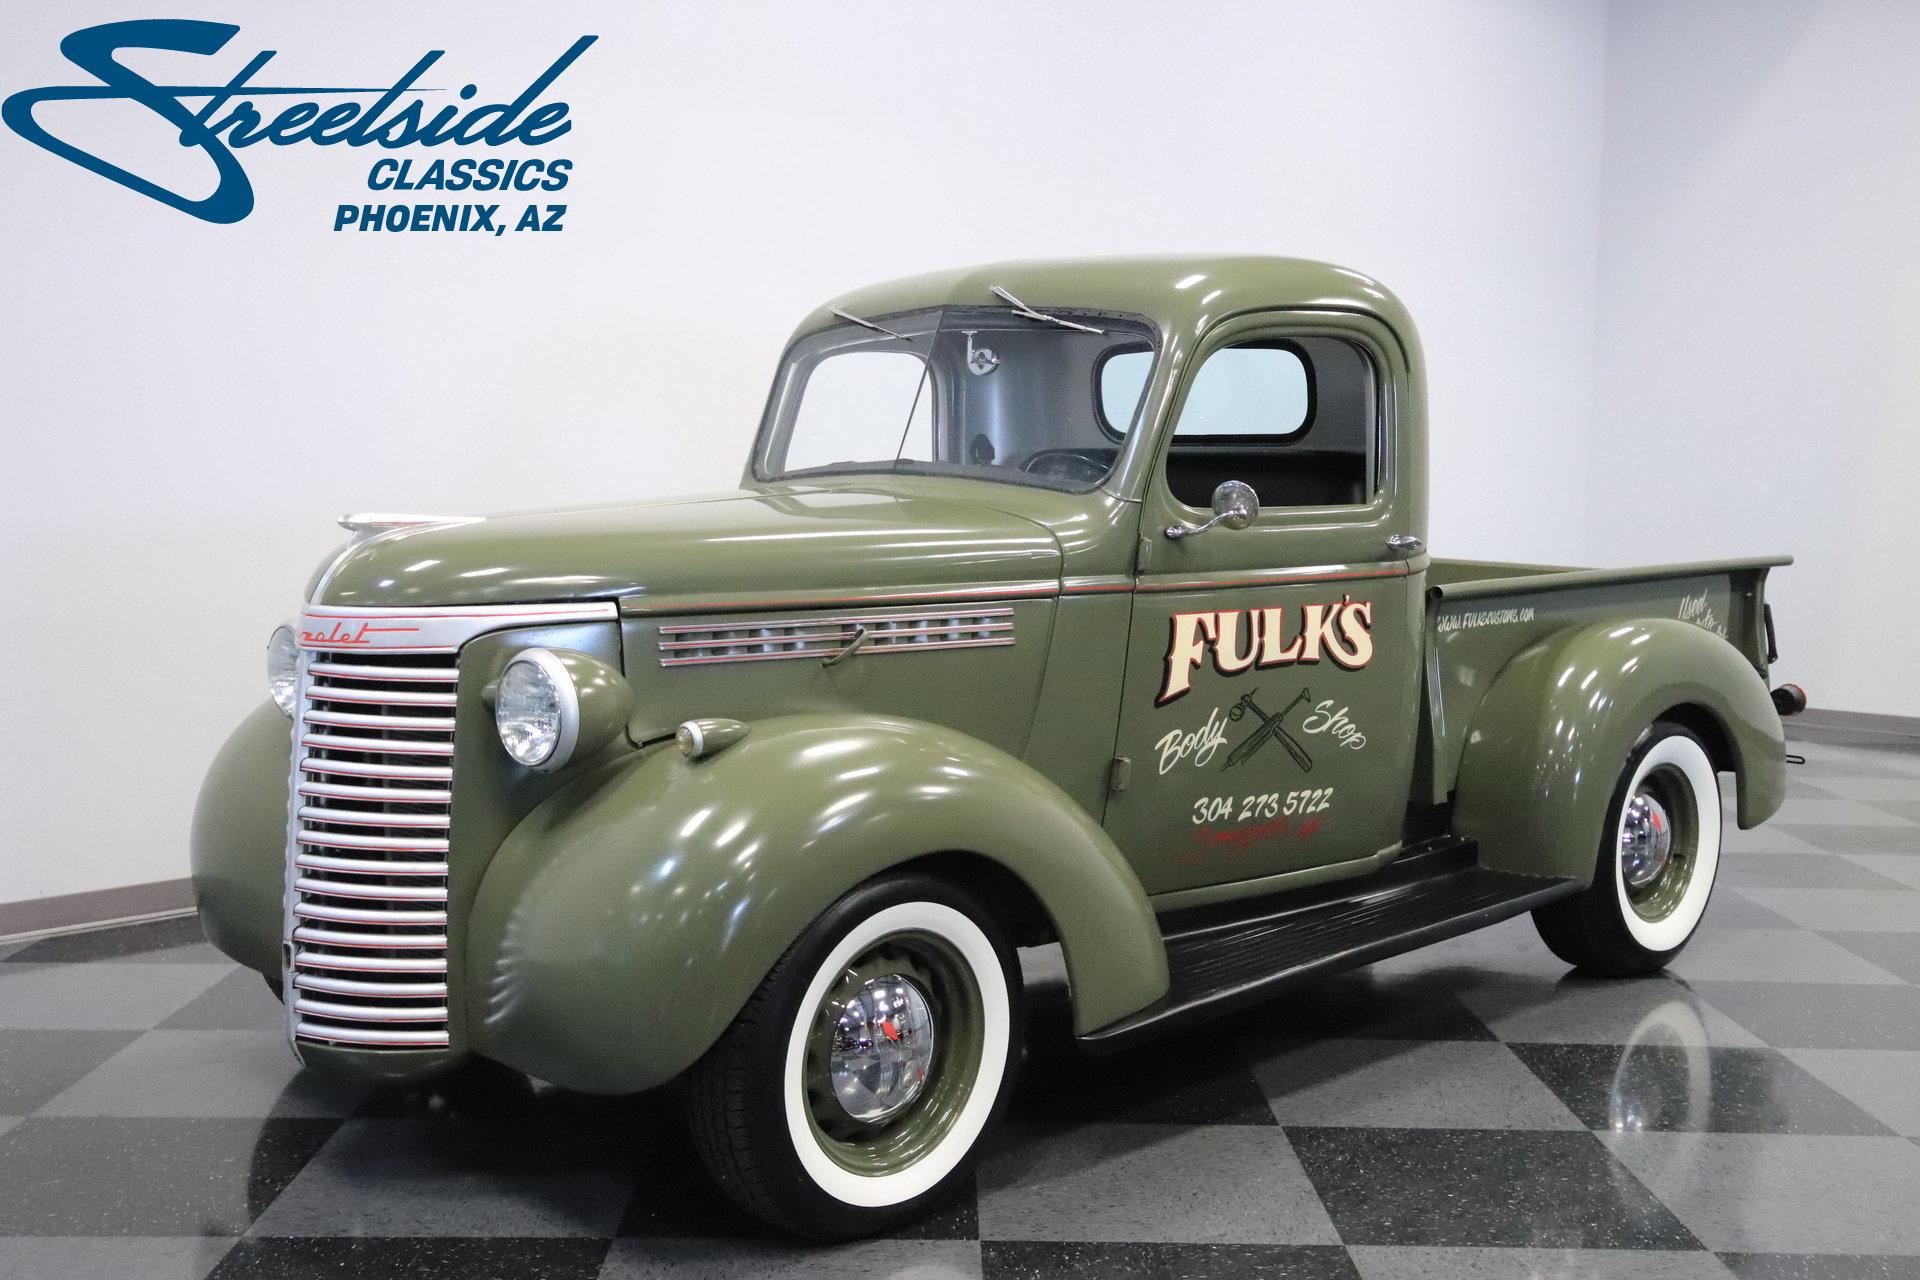 1940 chevrolet 3 4 ton pickup streetside classics the nation 39 s trusted classic car. Black Bedroom Furniture Sets. Home Design Ideas